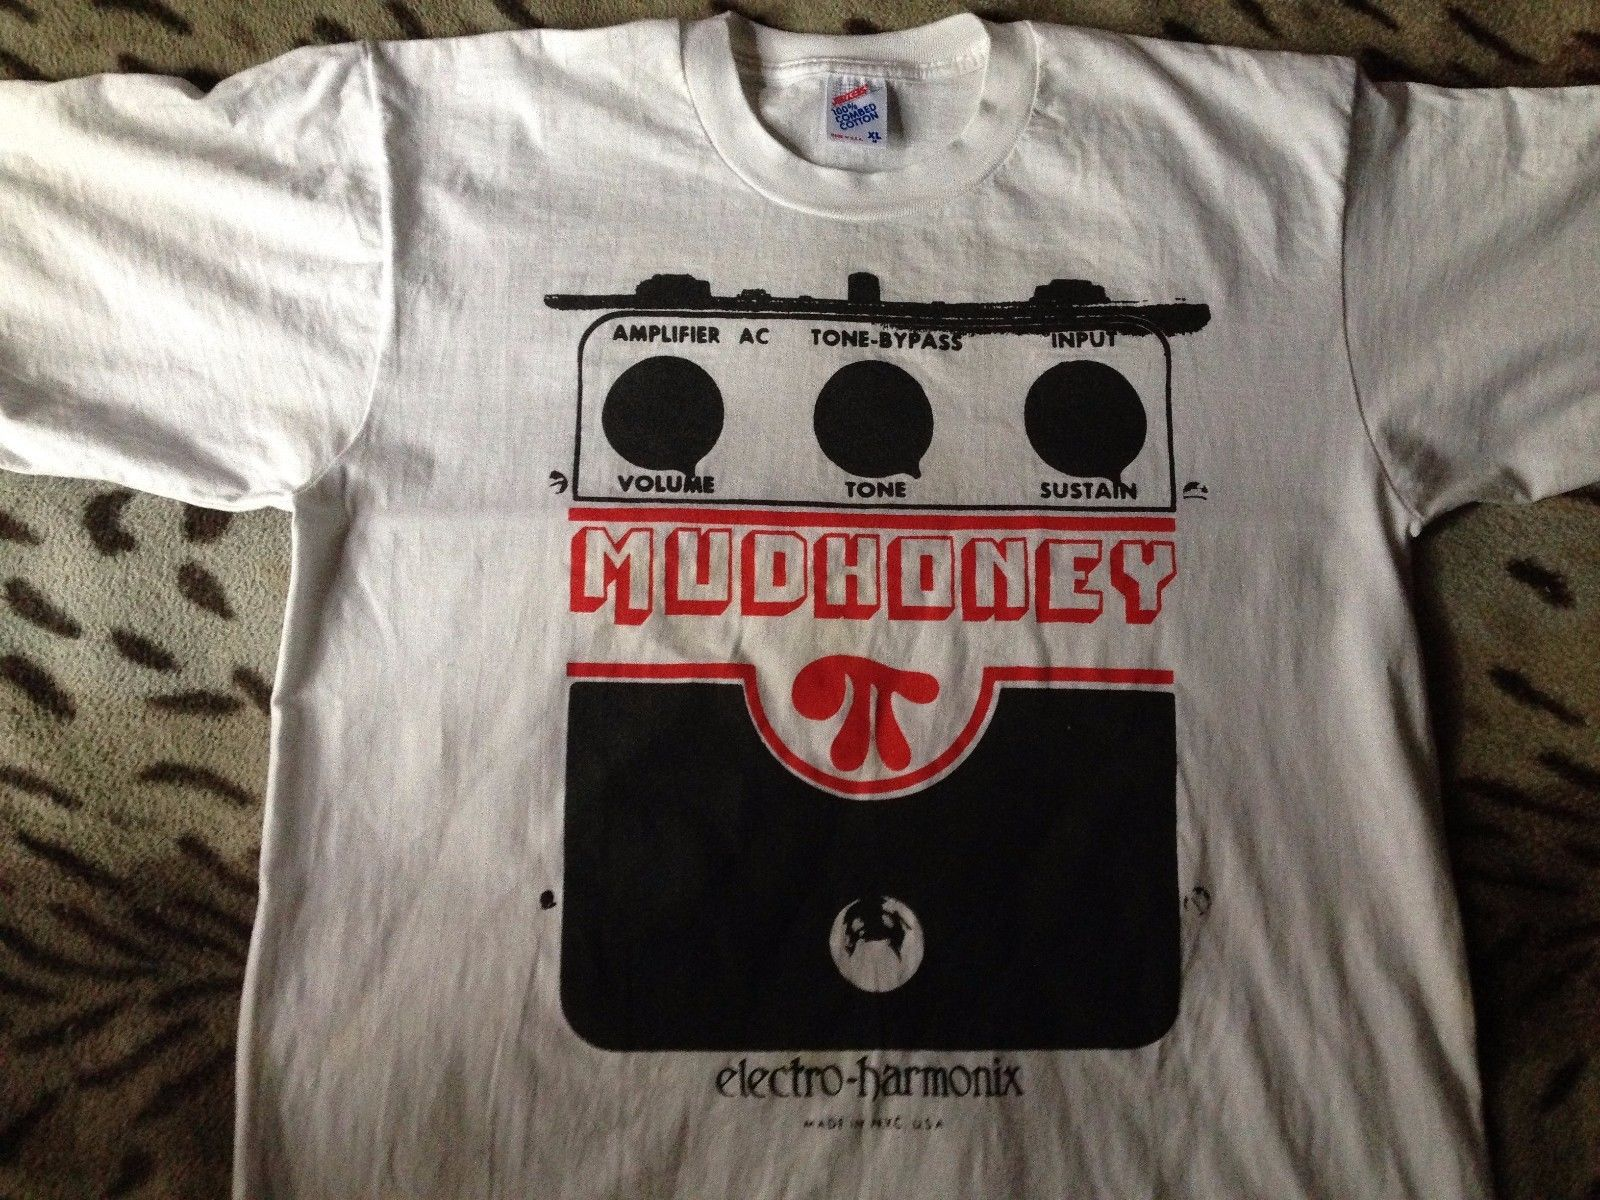 bbd928c4 Mudhoney Superfuzz Bigmuff 1988 Vintage T-Shirt Sub Pop Original In Out Of  Grace